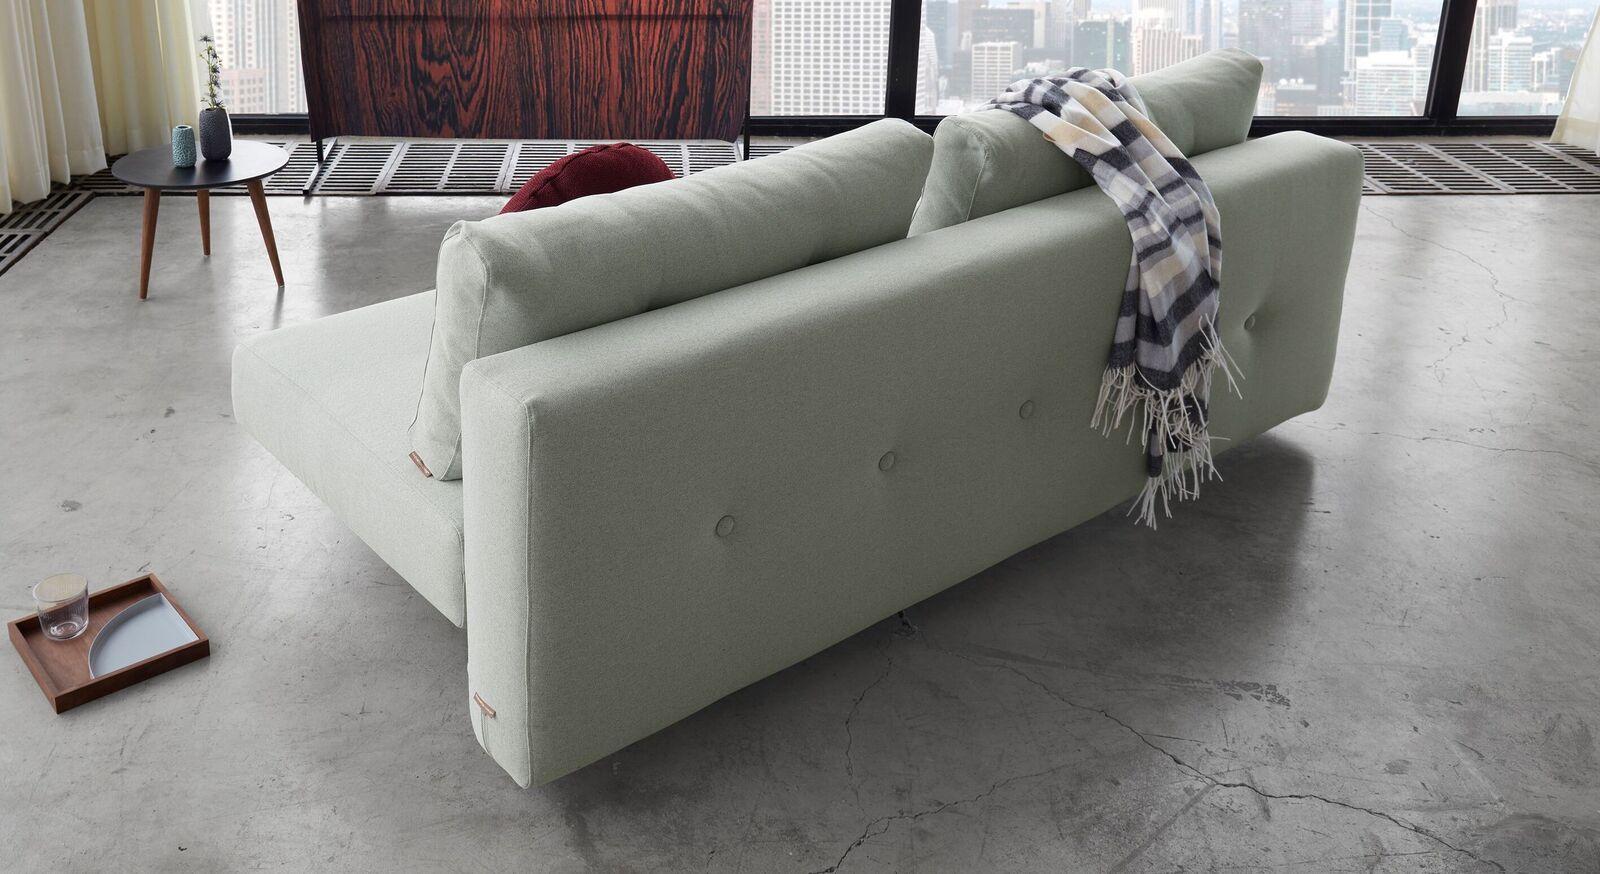 Schlafsofa Barnes im innovativem Design